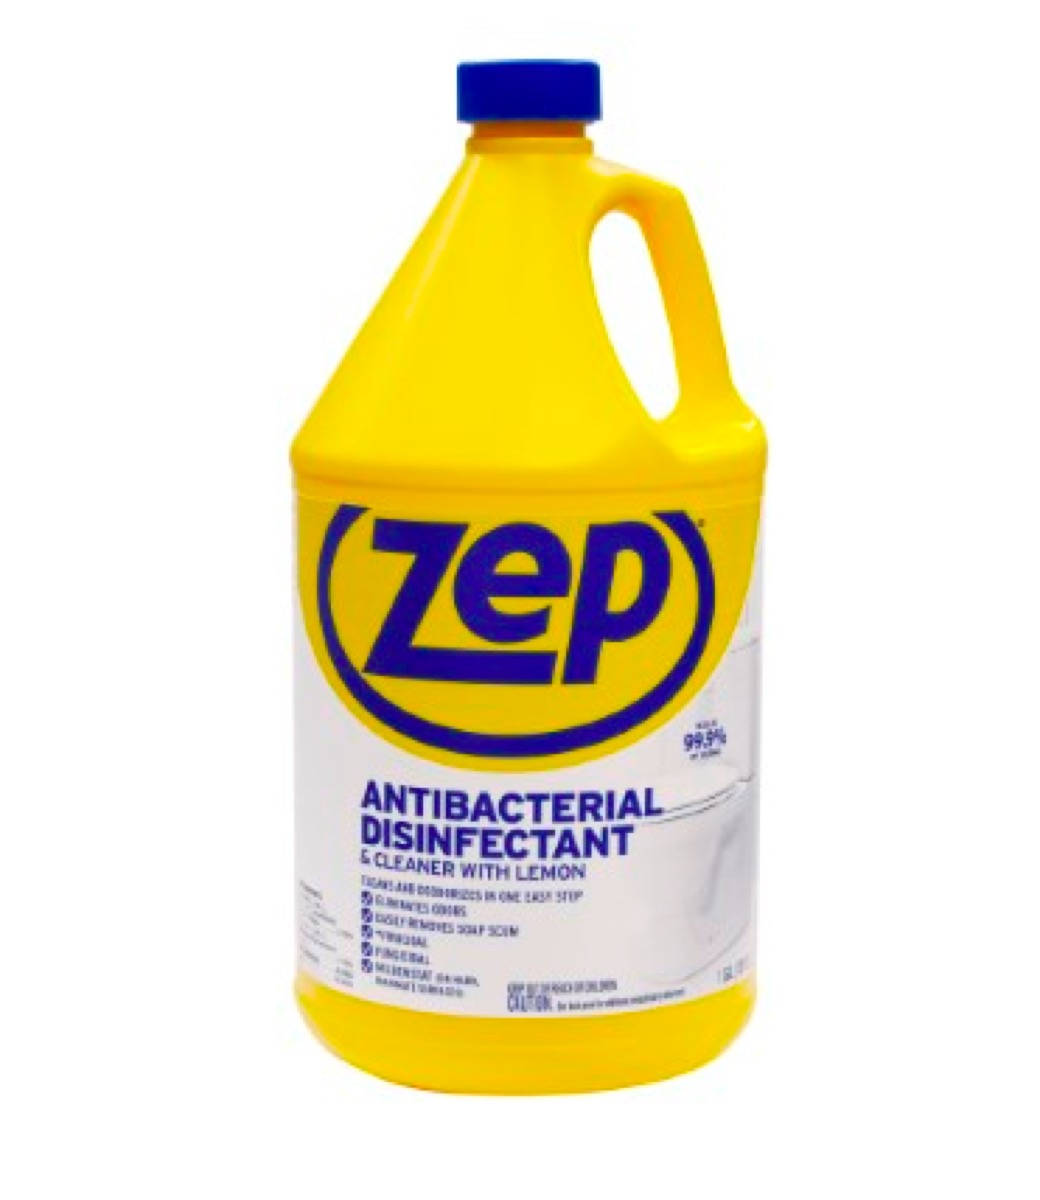 Zep Antibacterial Disinfectant & Cleaner with Lemon